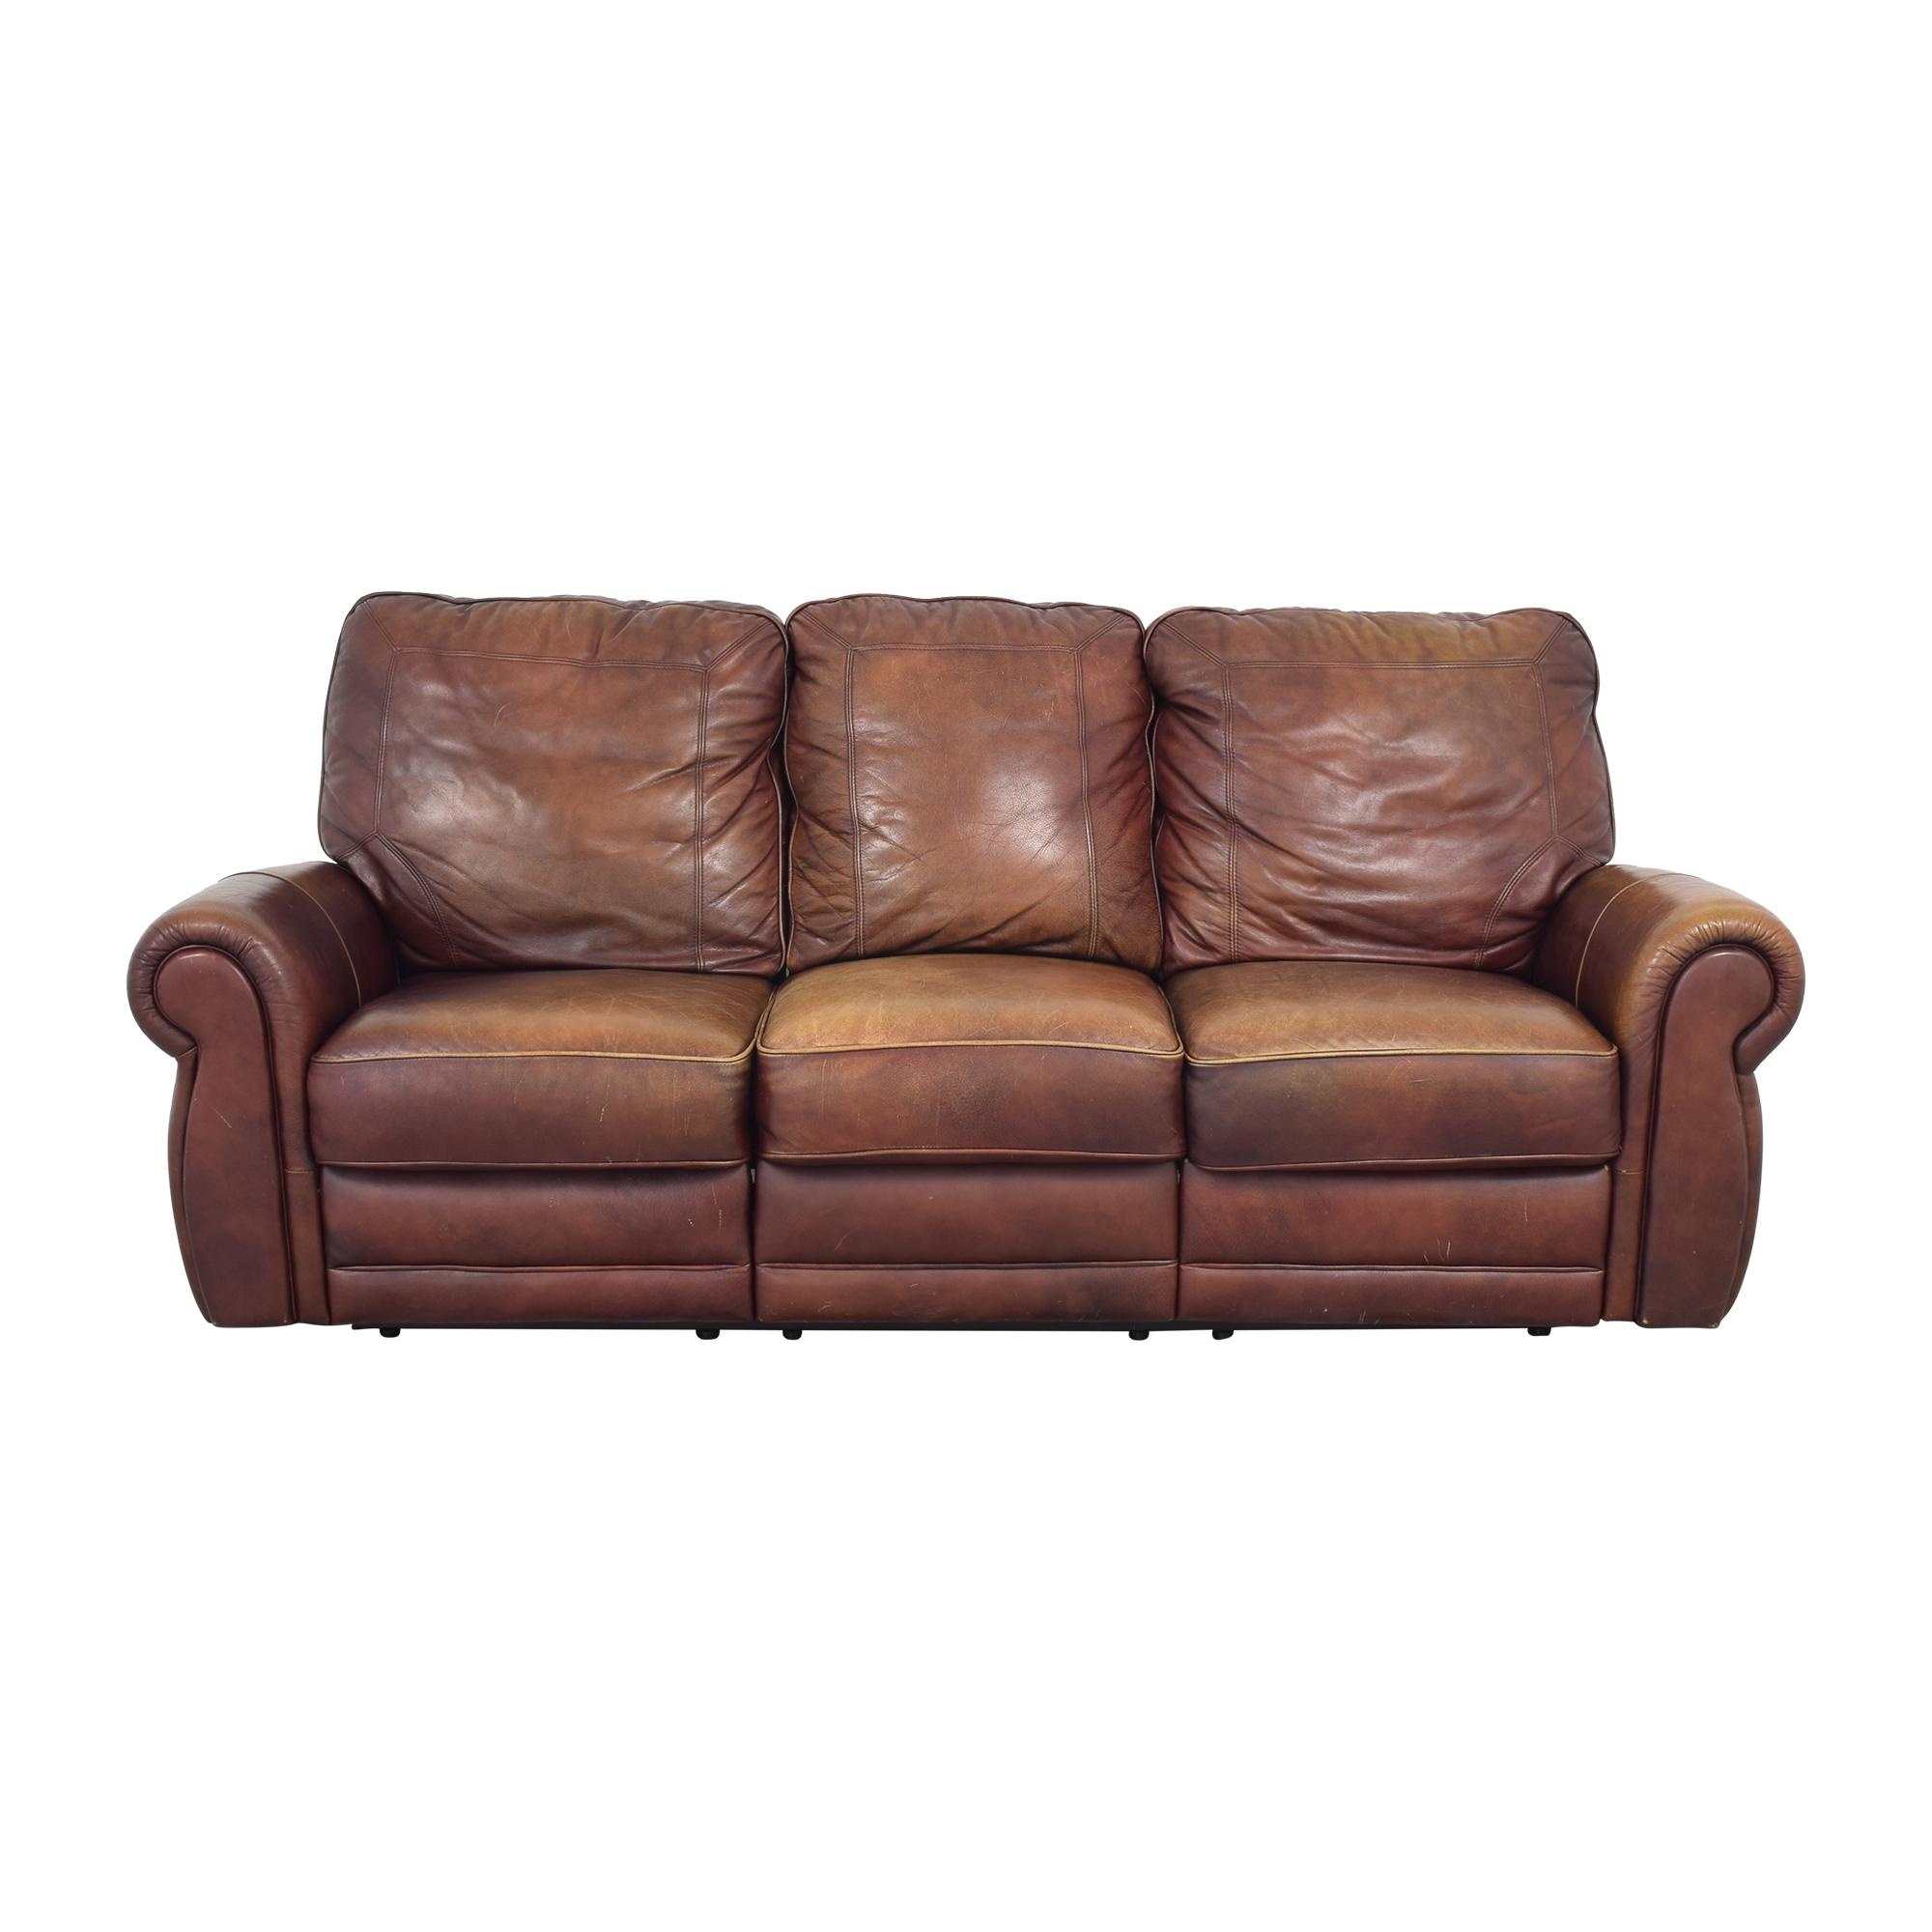 buy  Three Cushion Reclining Sofa online